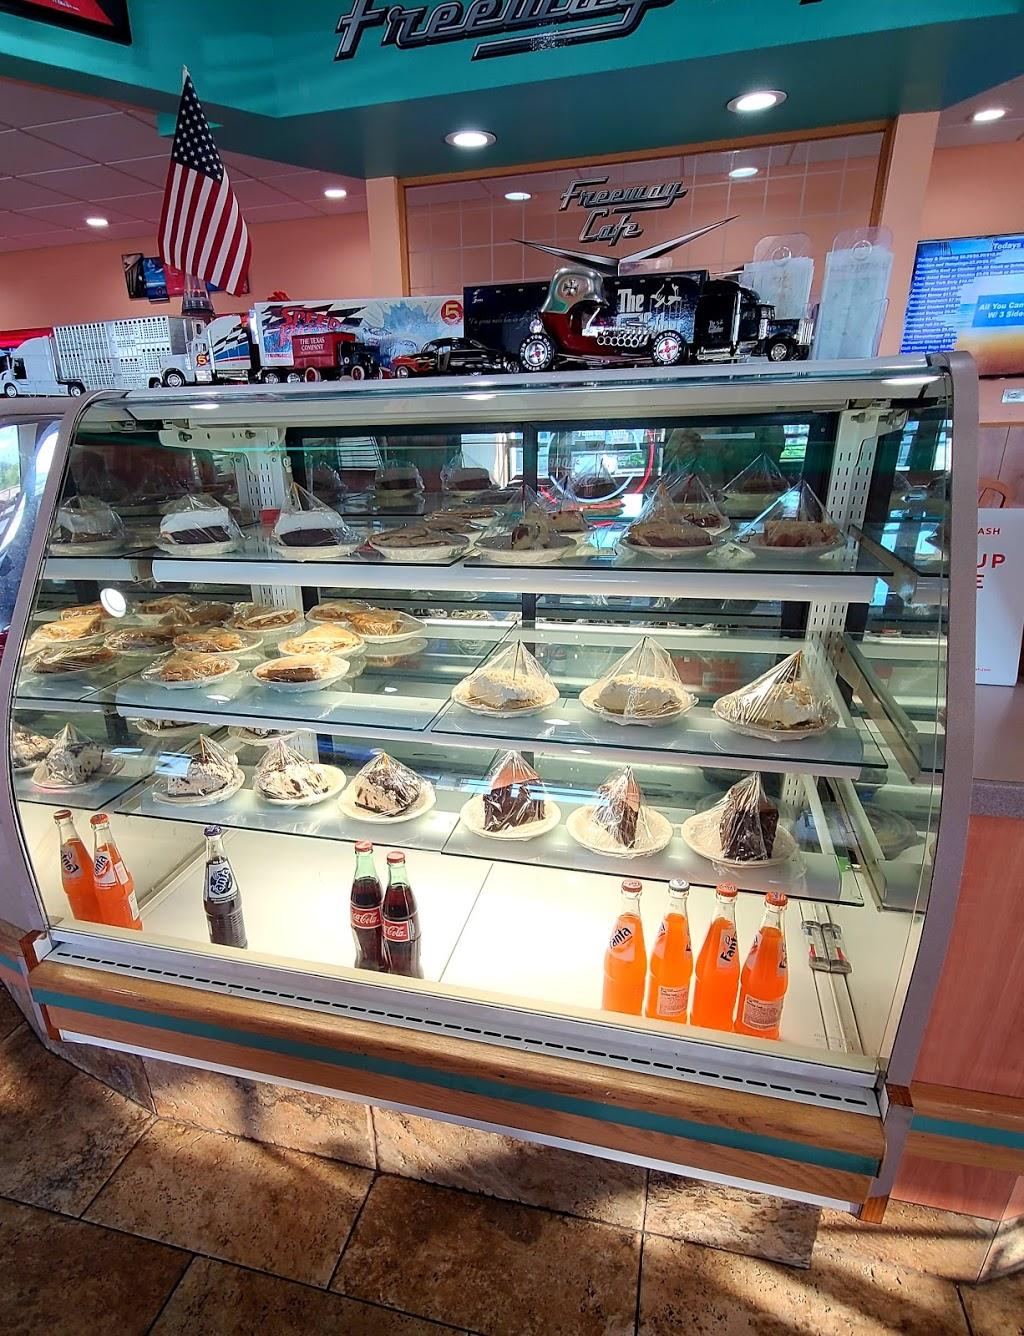 Freeway Cafe West - cafe    Photo 5 of 10   Address: 5849 S 49th W Ave, Tulsa, OK 74107, USA   Phone: (918) 292-8678